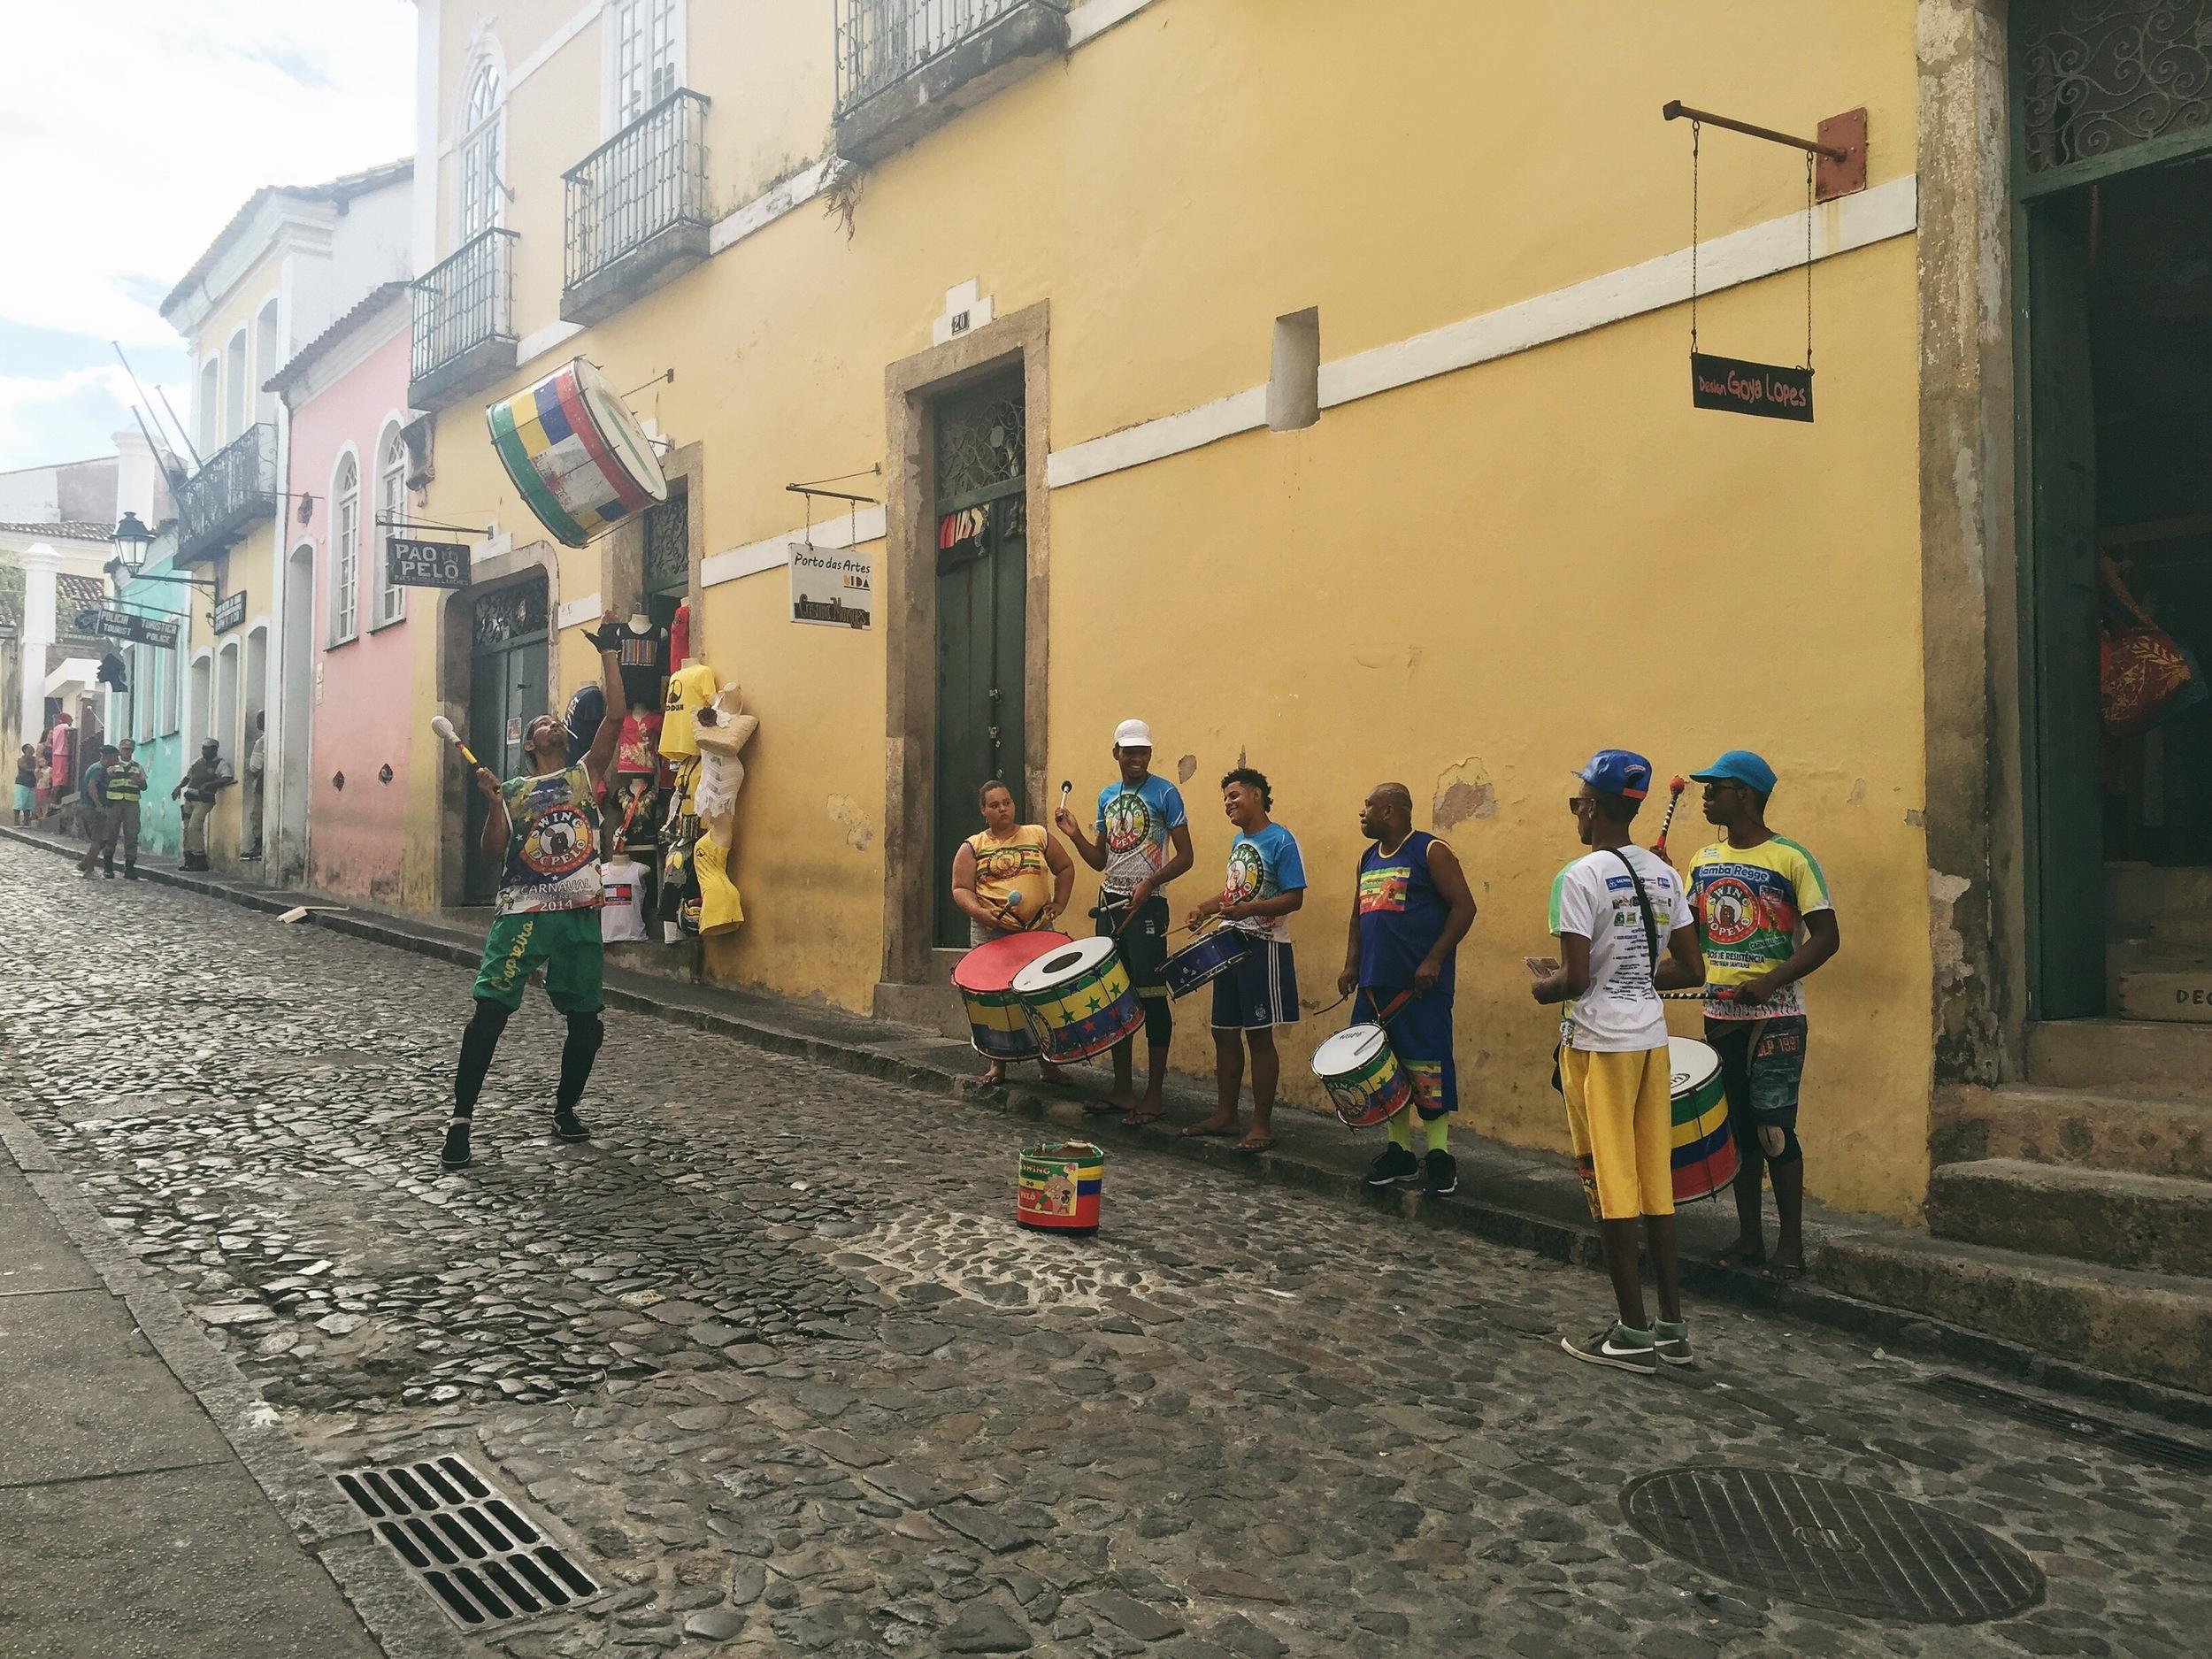 Drums at the streets of Pelourinho.